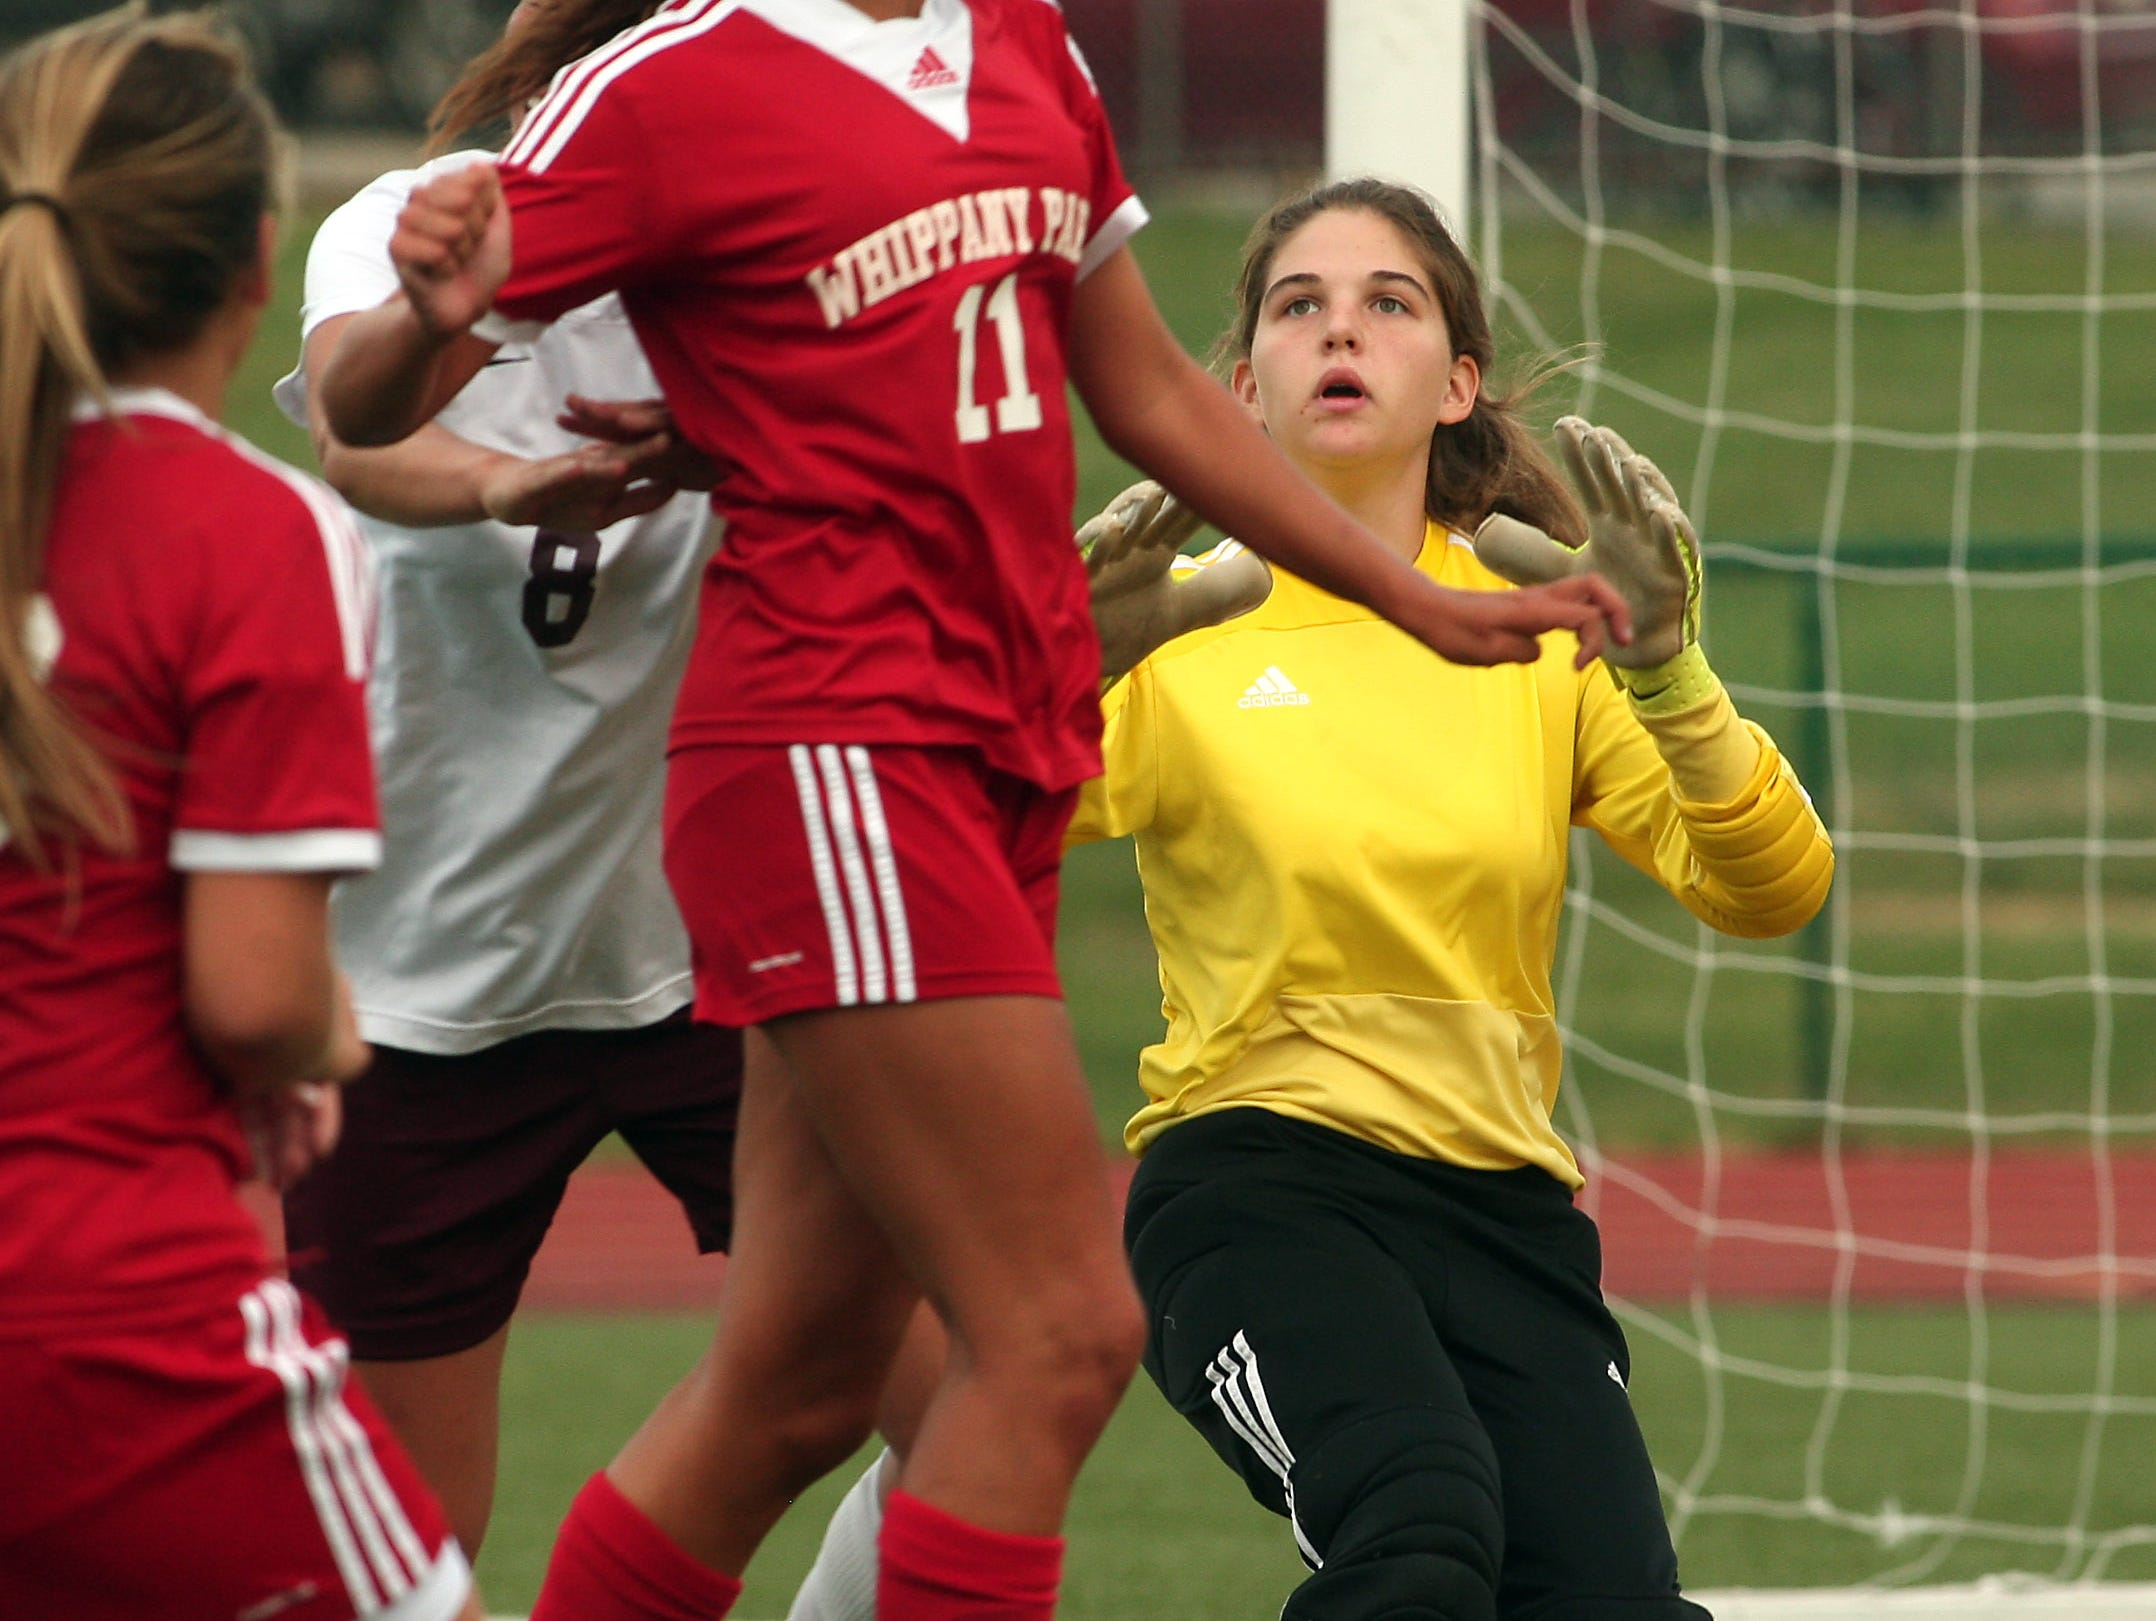 Whippany Park's Silvana Poulter heads in a ball for a goal vs. Madison during their girls soccer matchup. September 22, 2015, Madison, NJ.